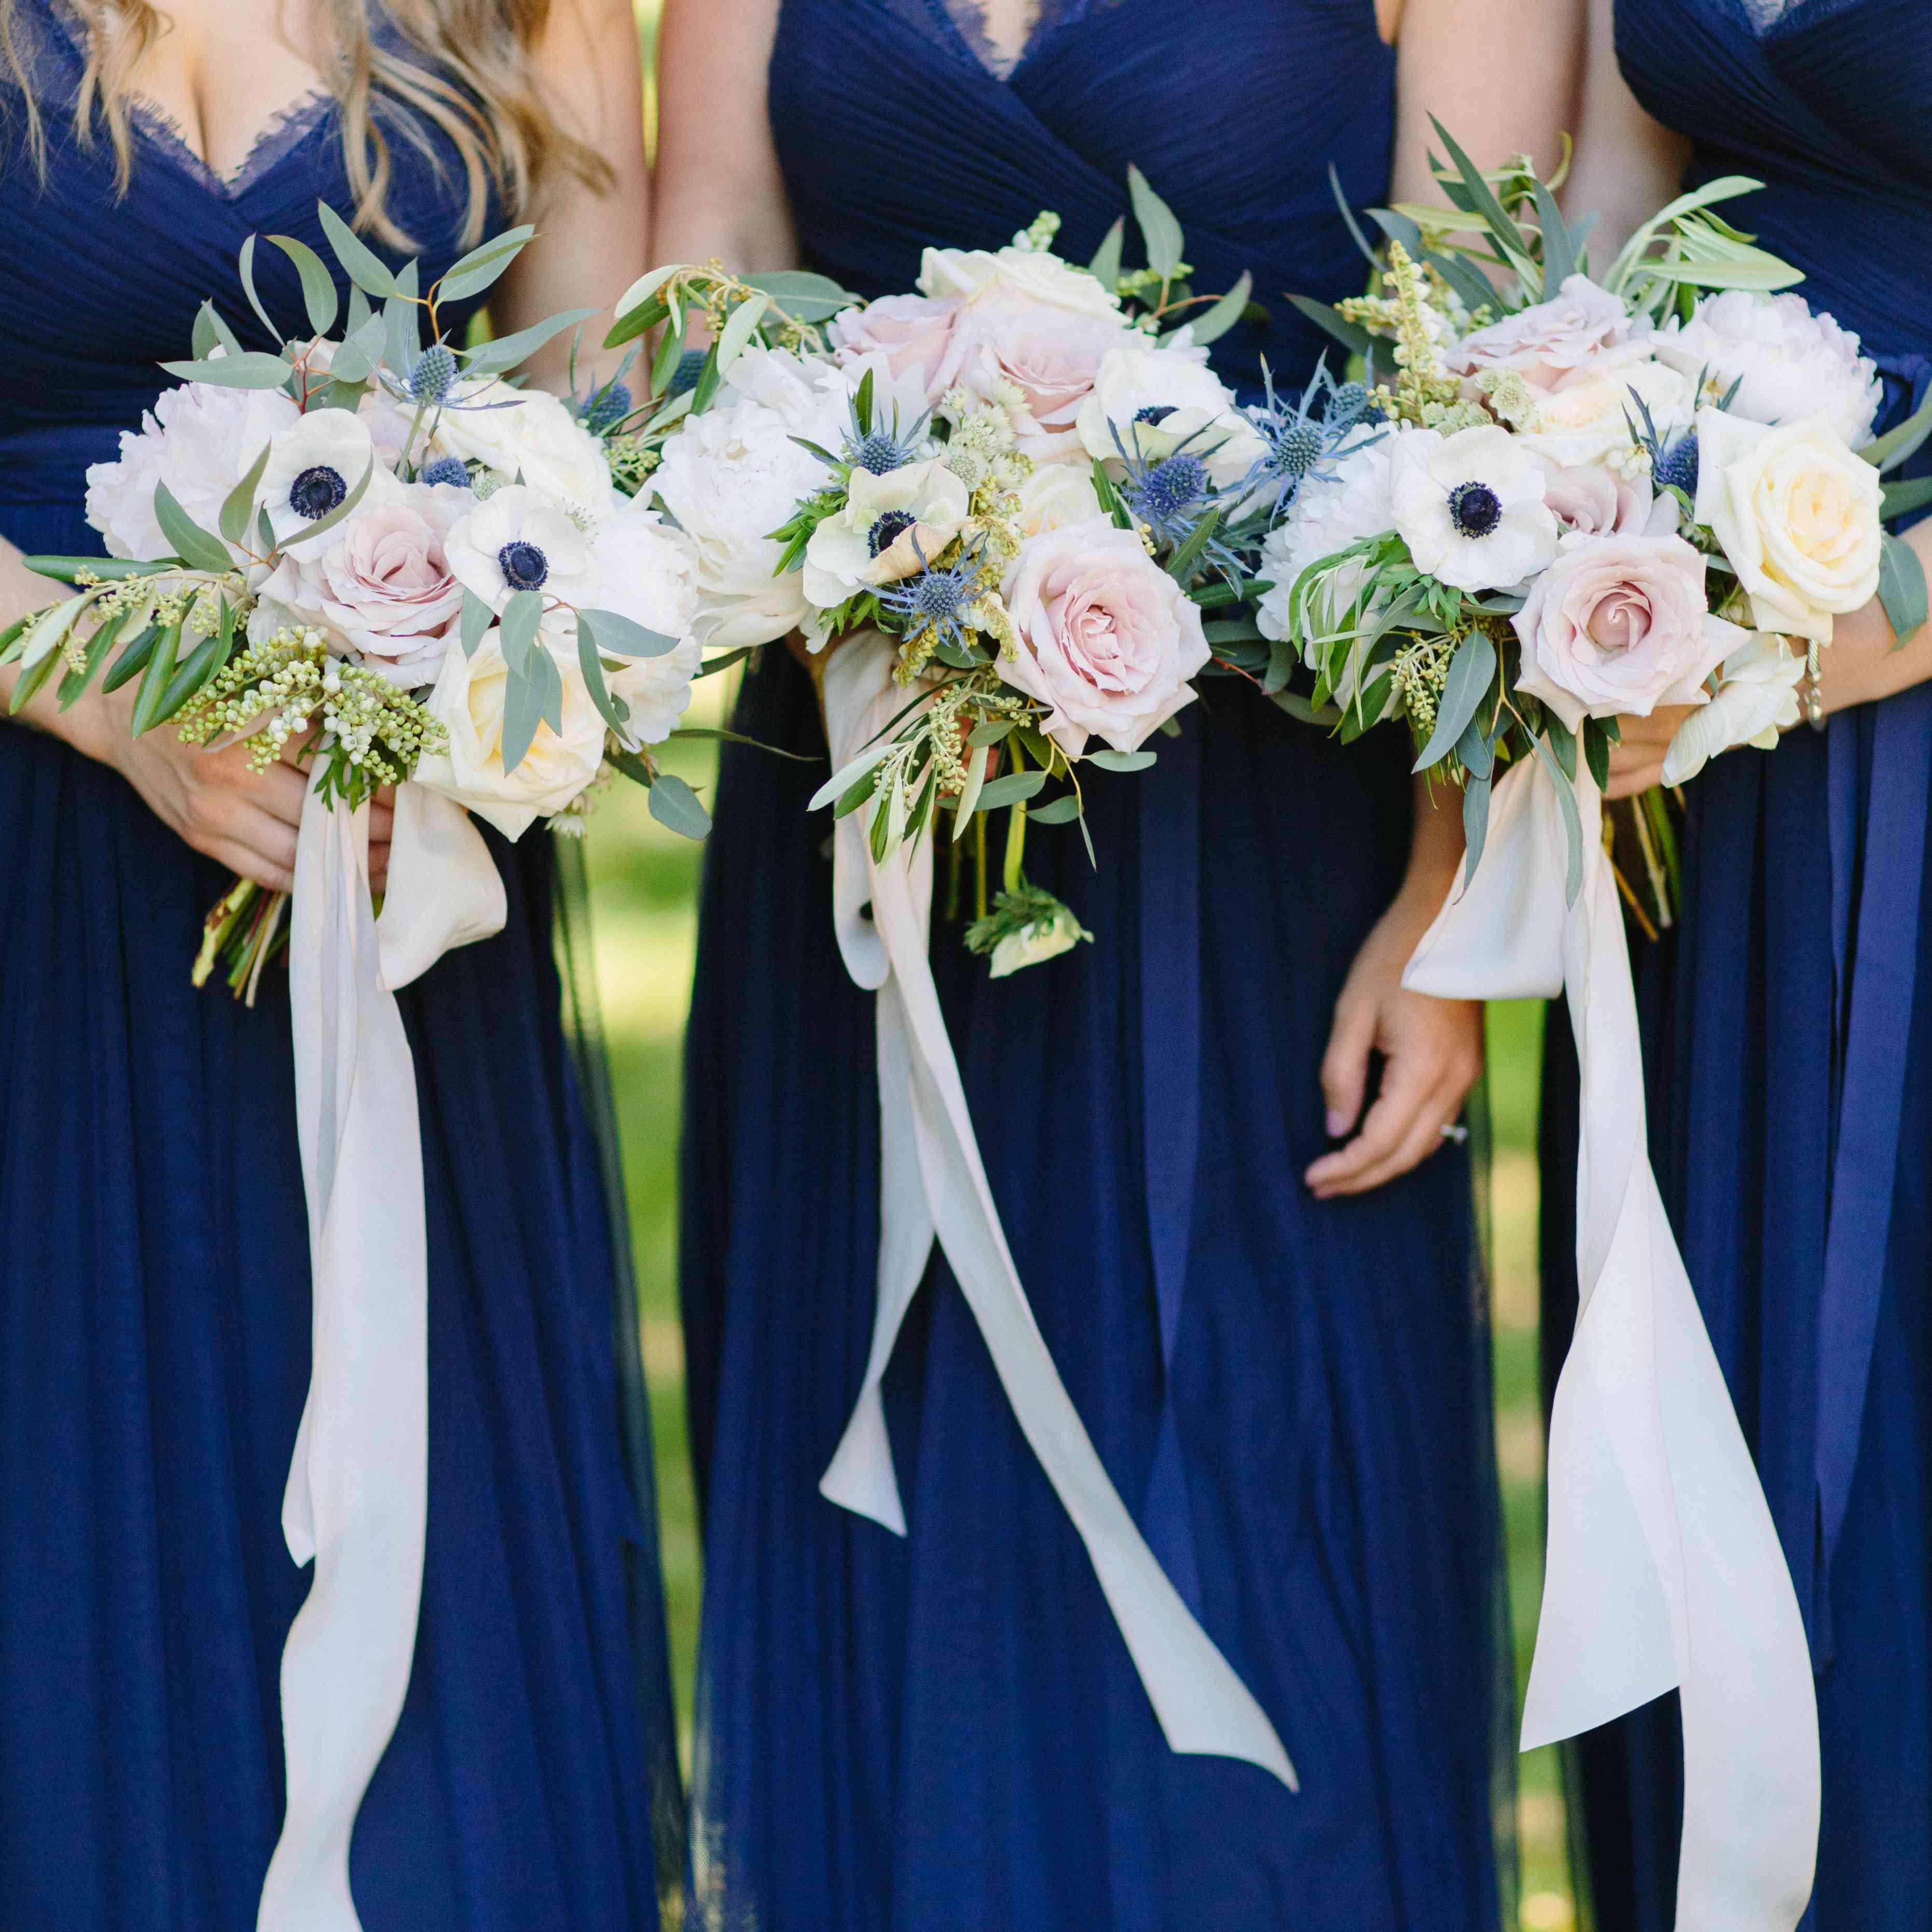 Bridesmaids holding bouquets